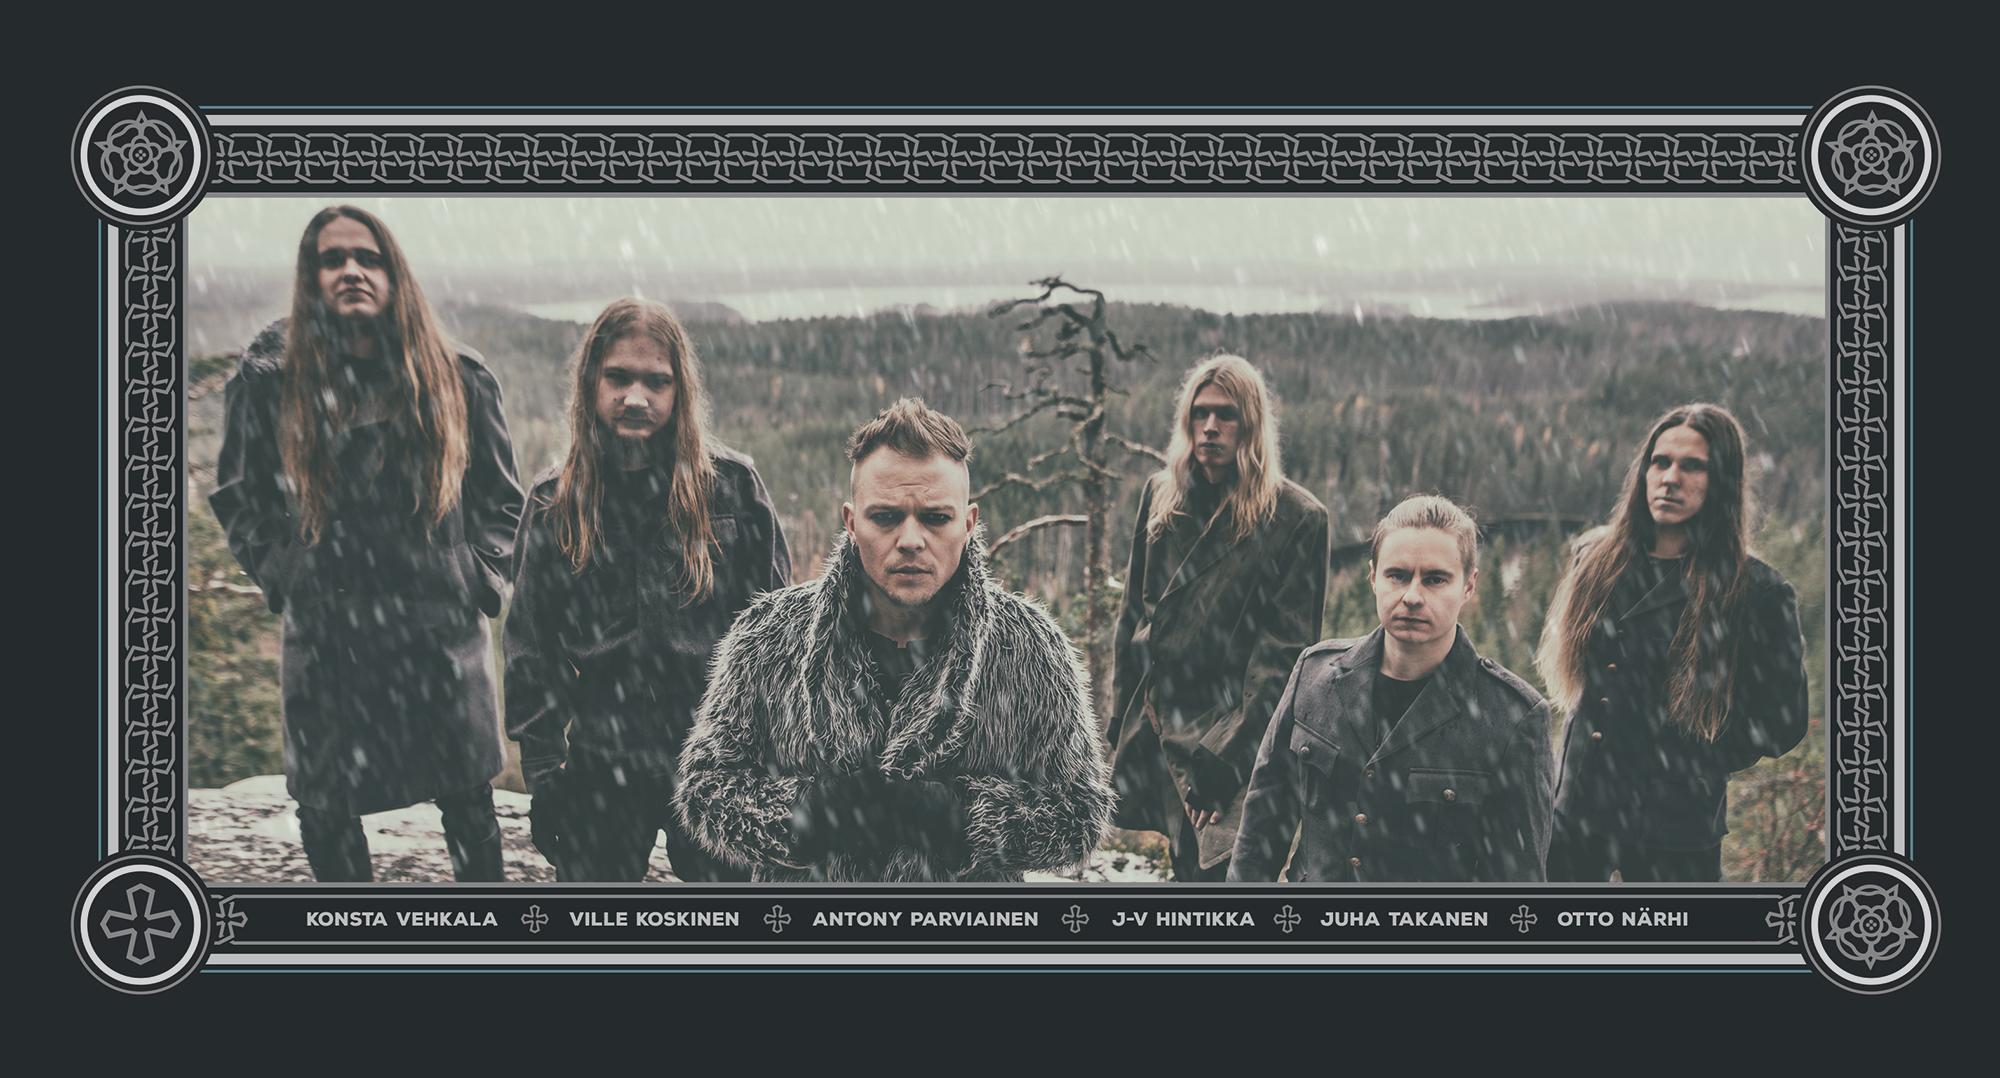 Psychework - Bandphoto, Photo by Jaakko Manninen